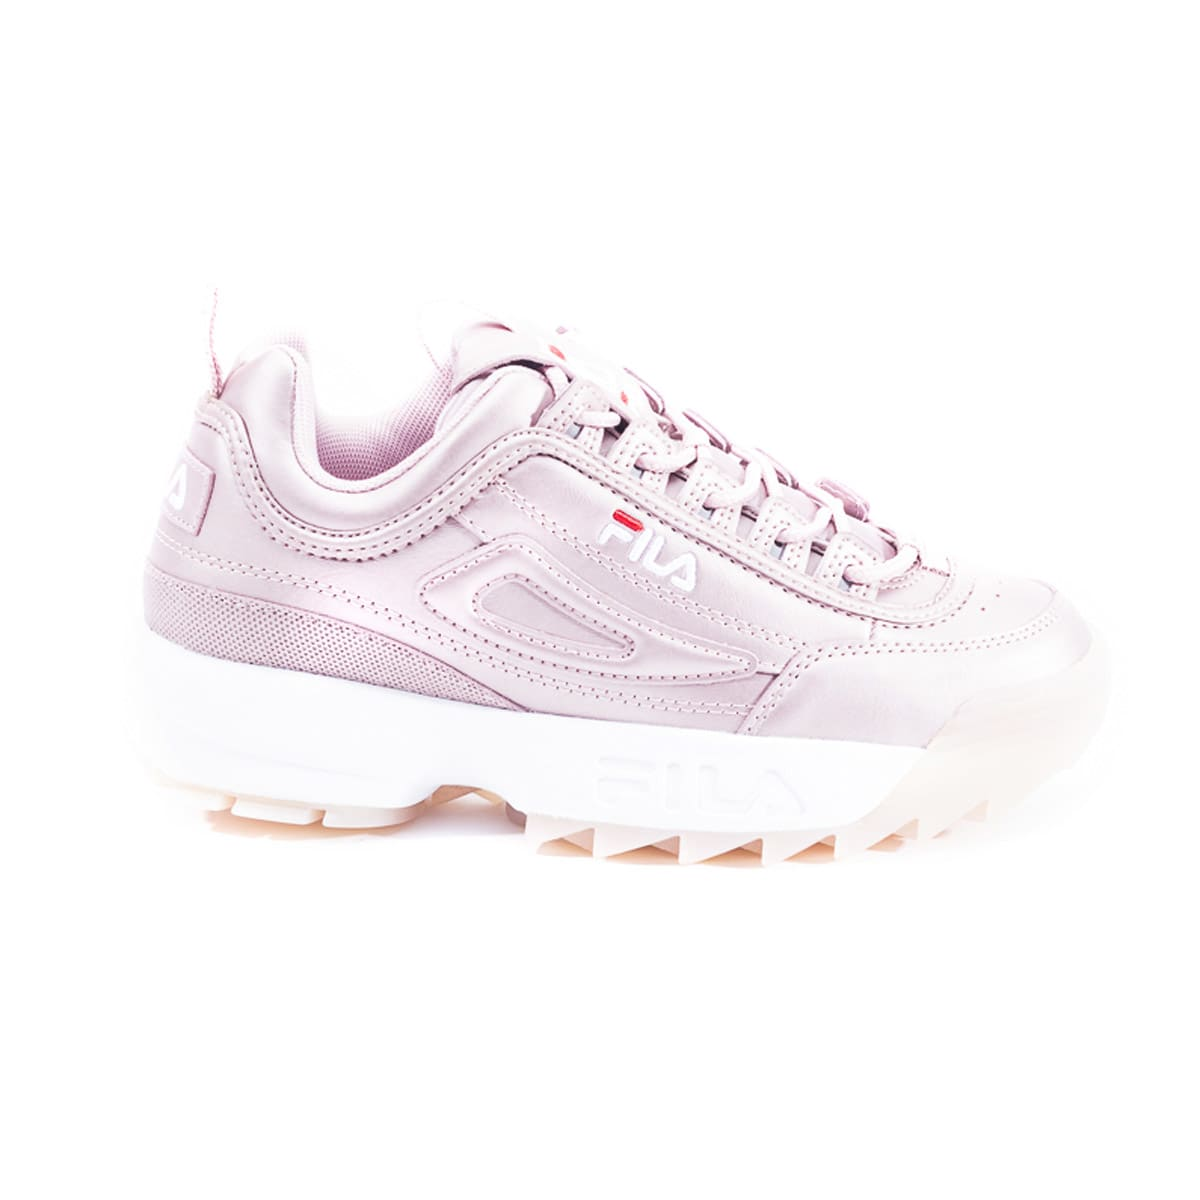 a604457e Fila Disruptor M Low Sneakers